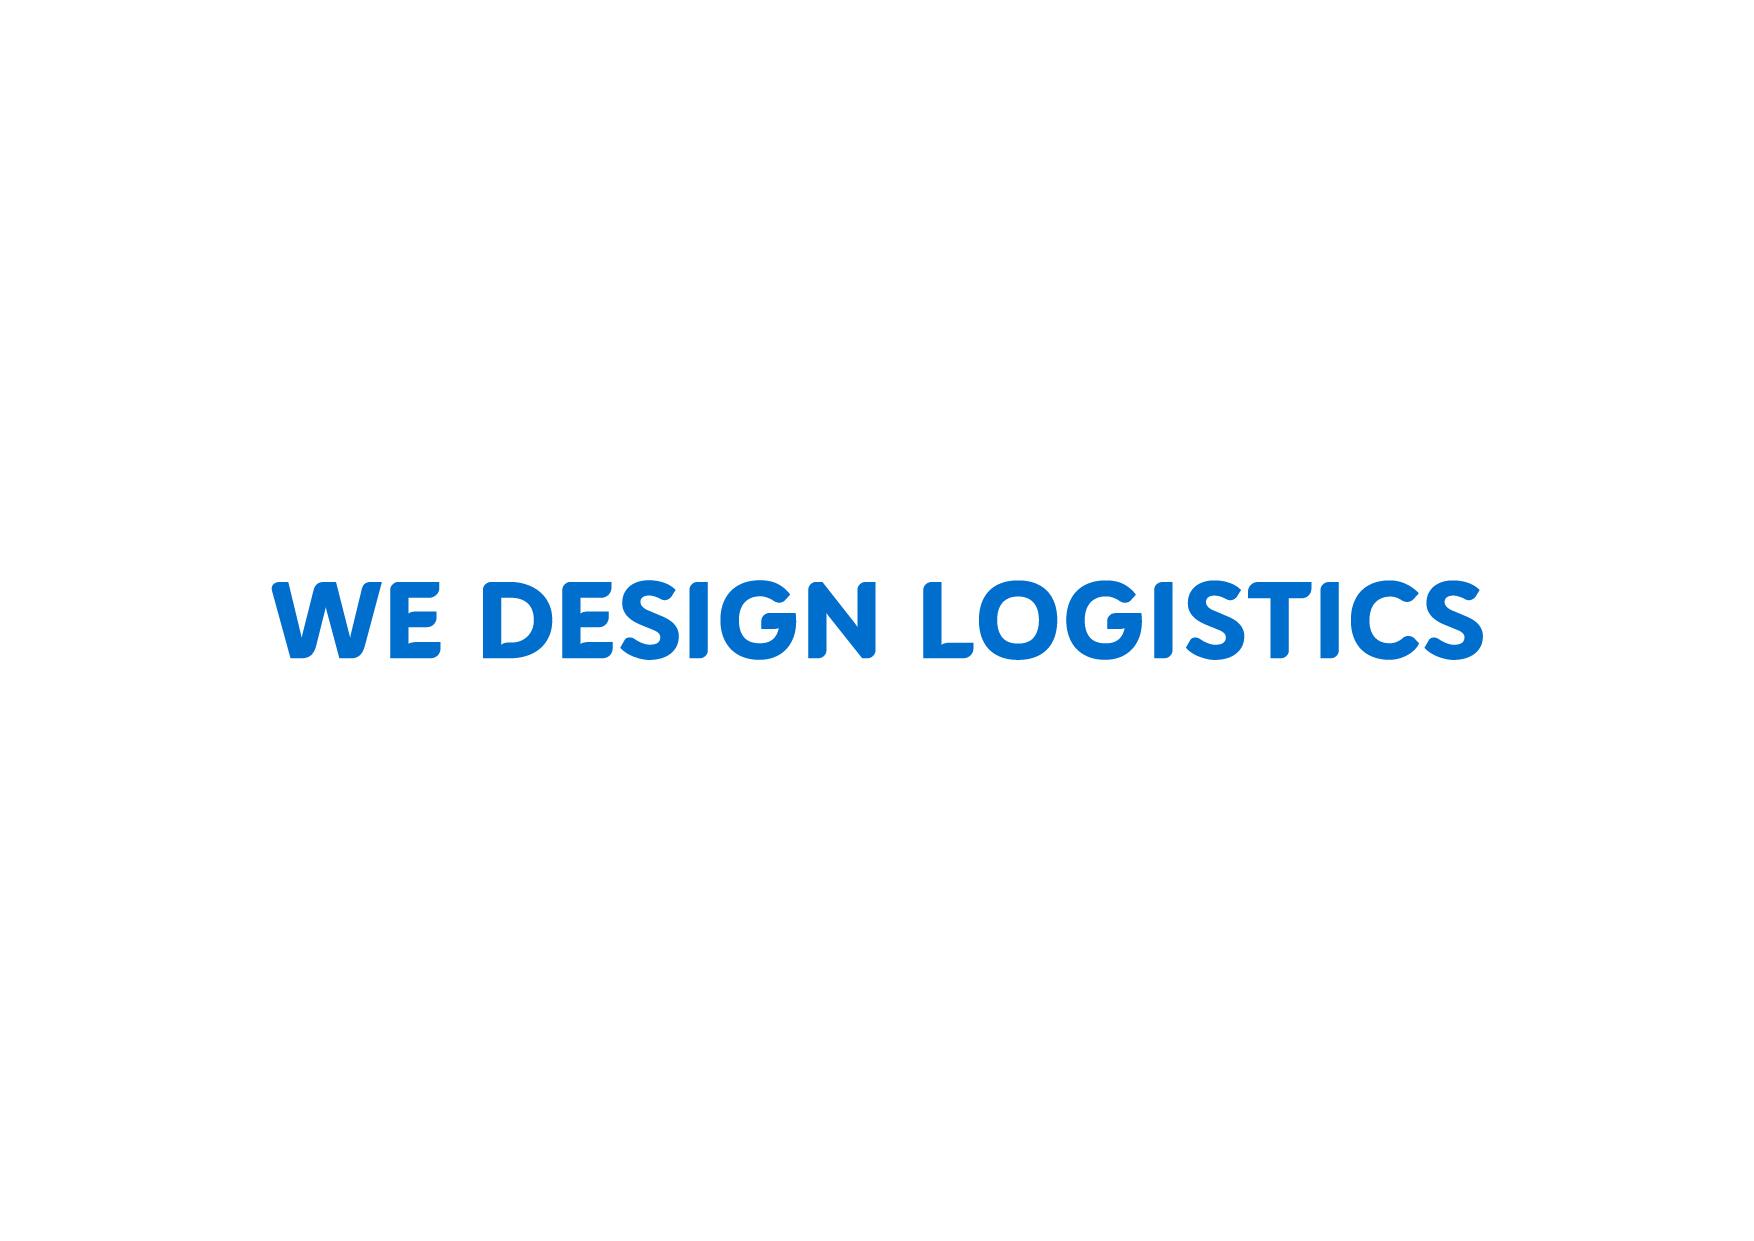 CJ Logistics Announces the Brand Slogan WE DESIGN LOGISTICS